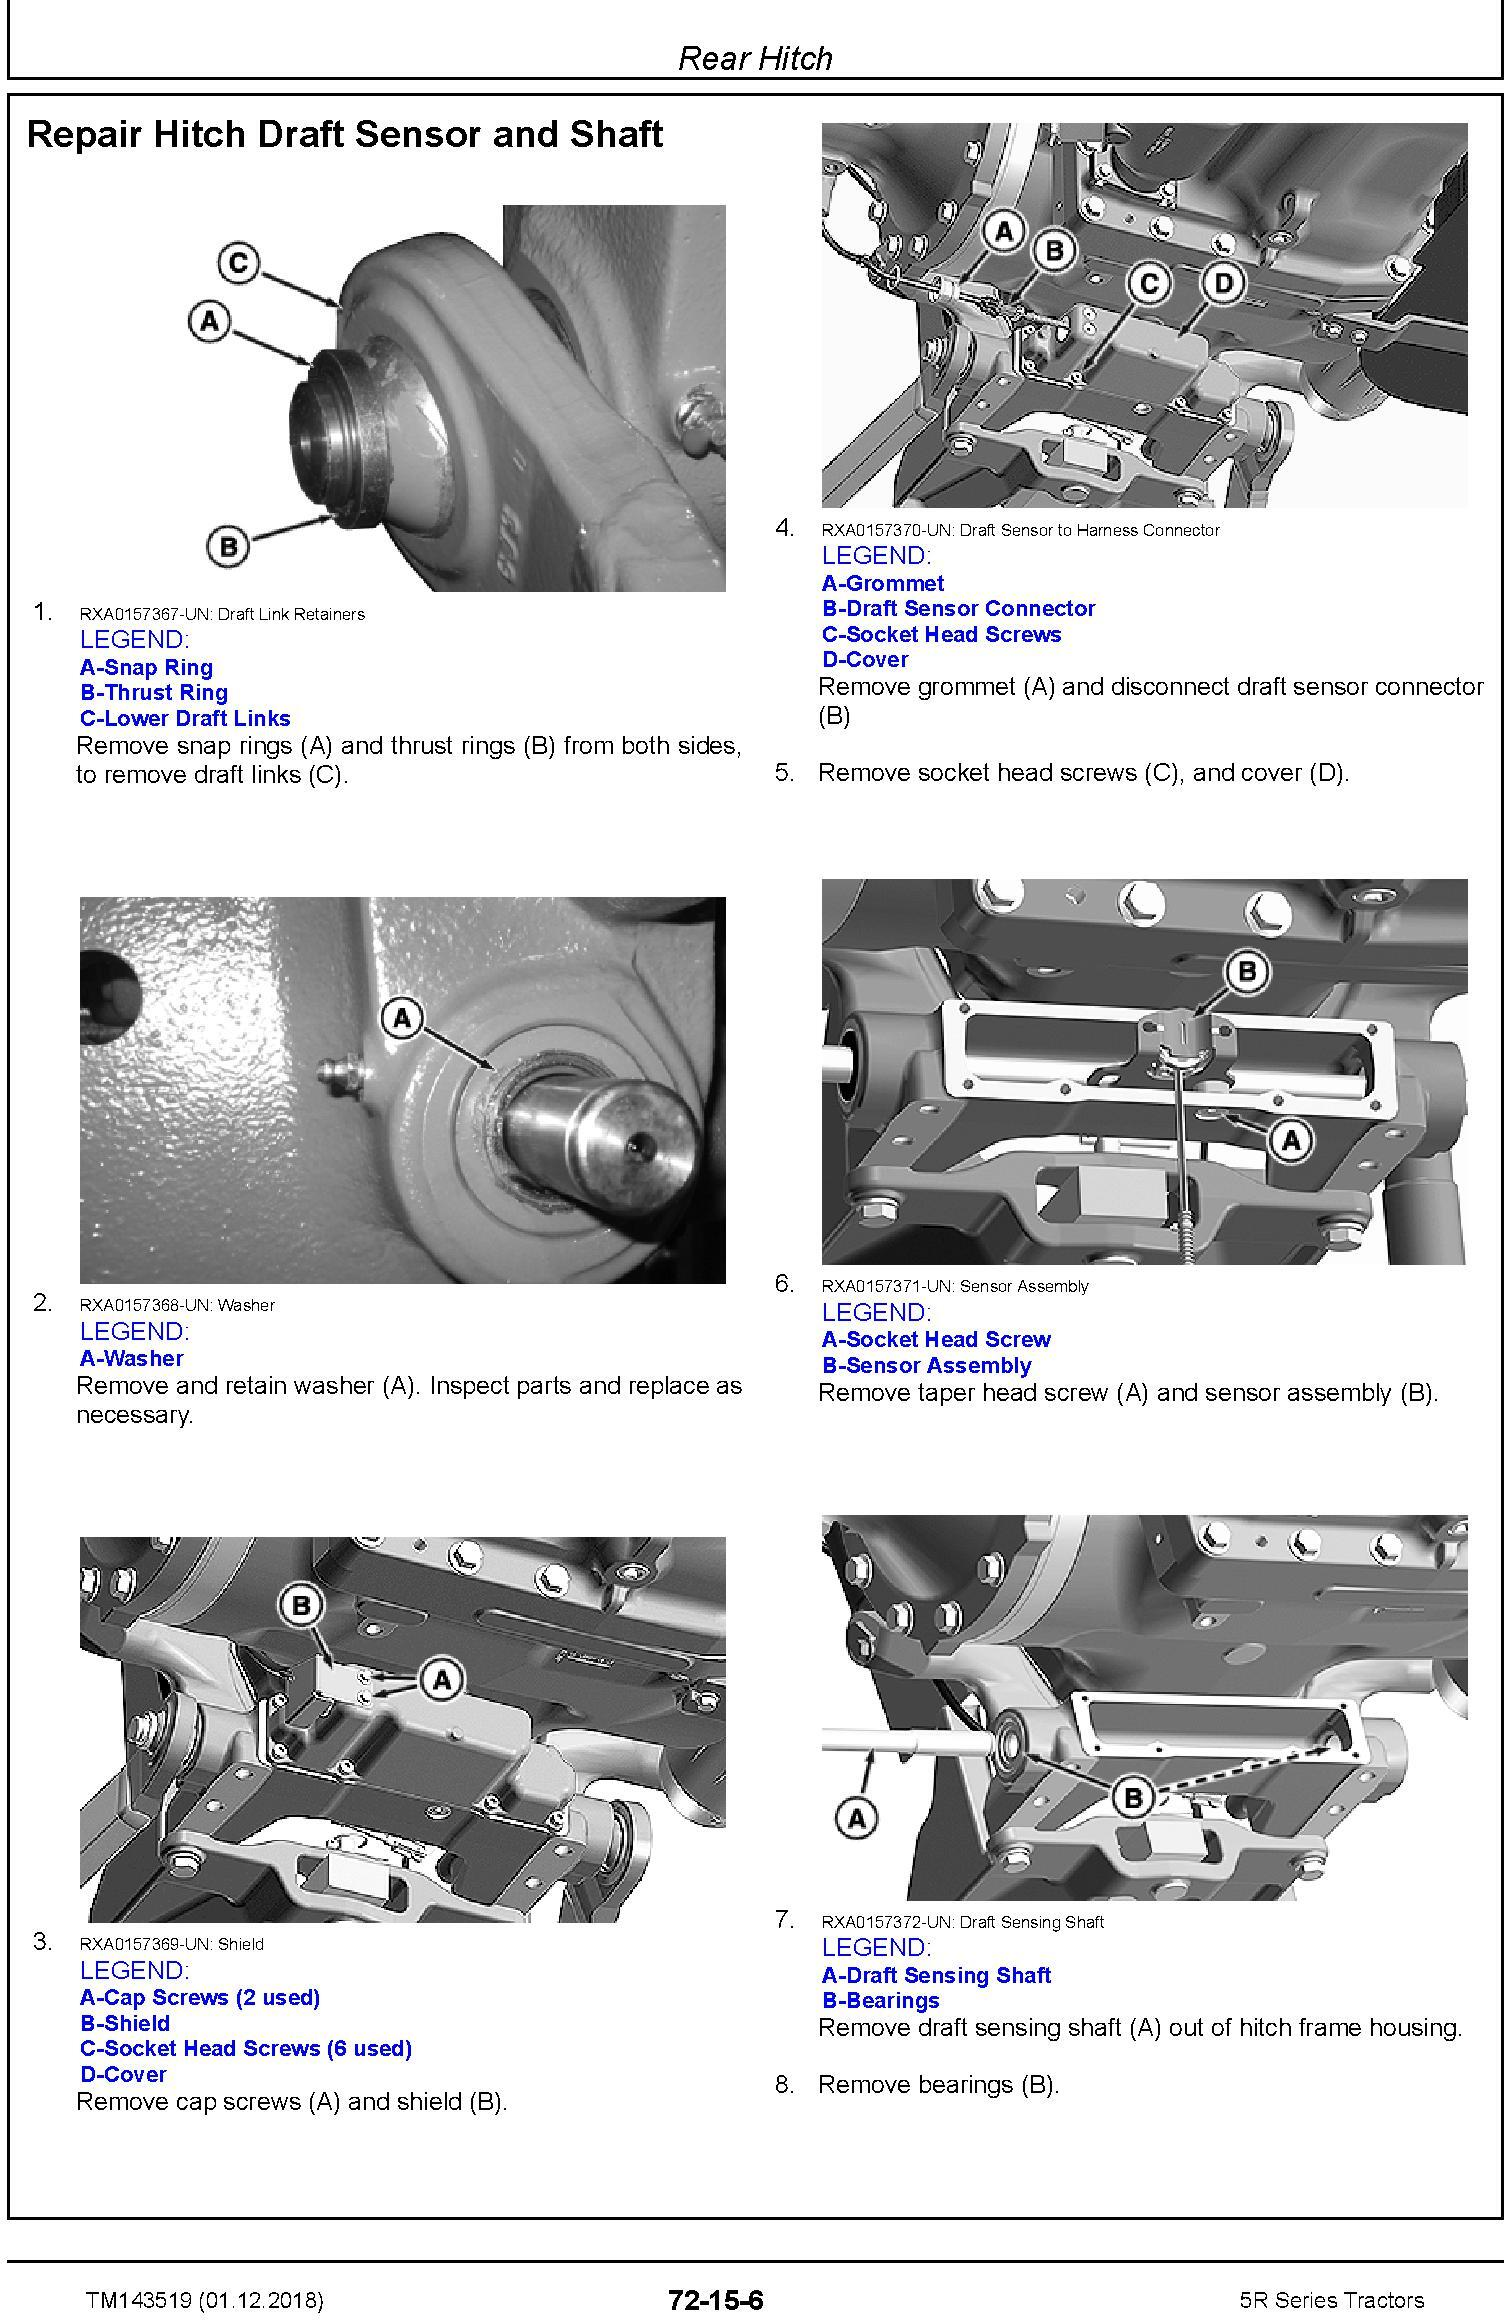 John Deere 5090R, 5100R, 5115R, 5115RH, 5125R Tractors Repair Technical Service Manual (TM143519) - 1